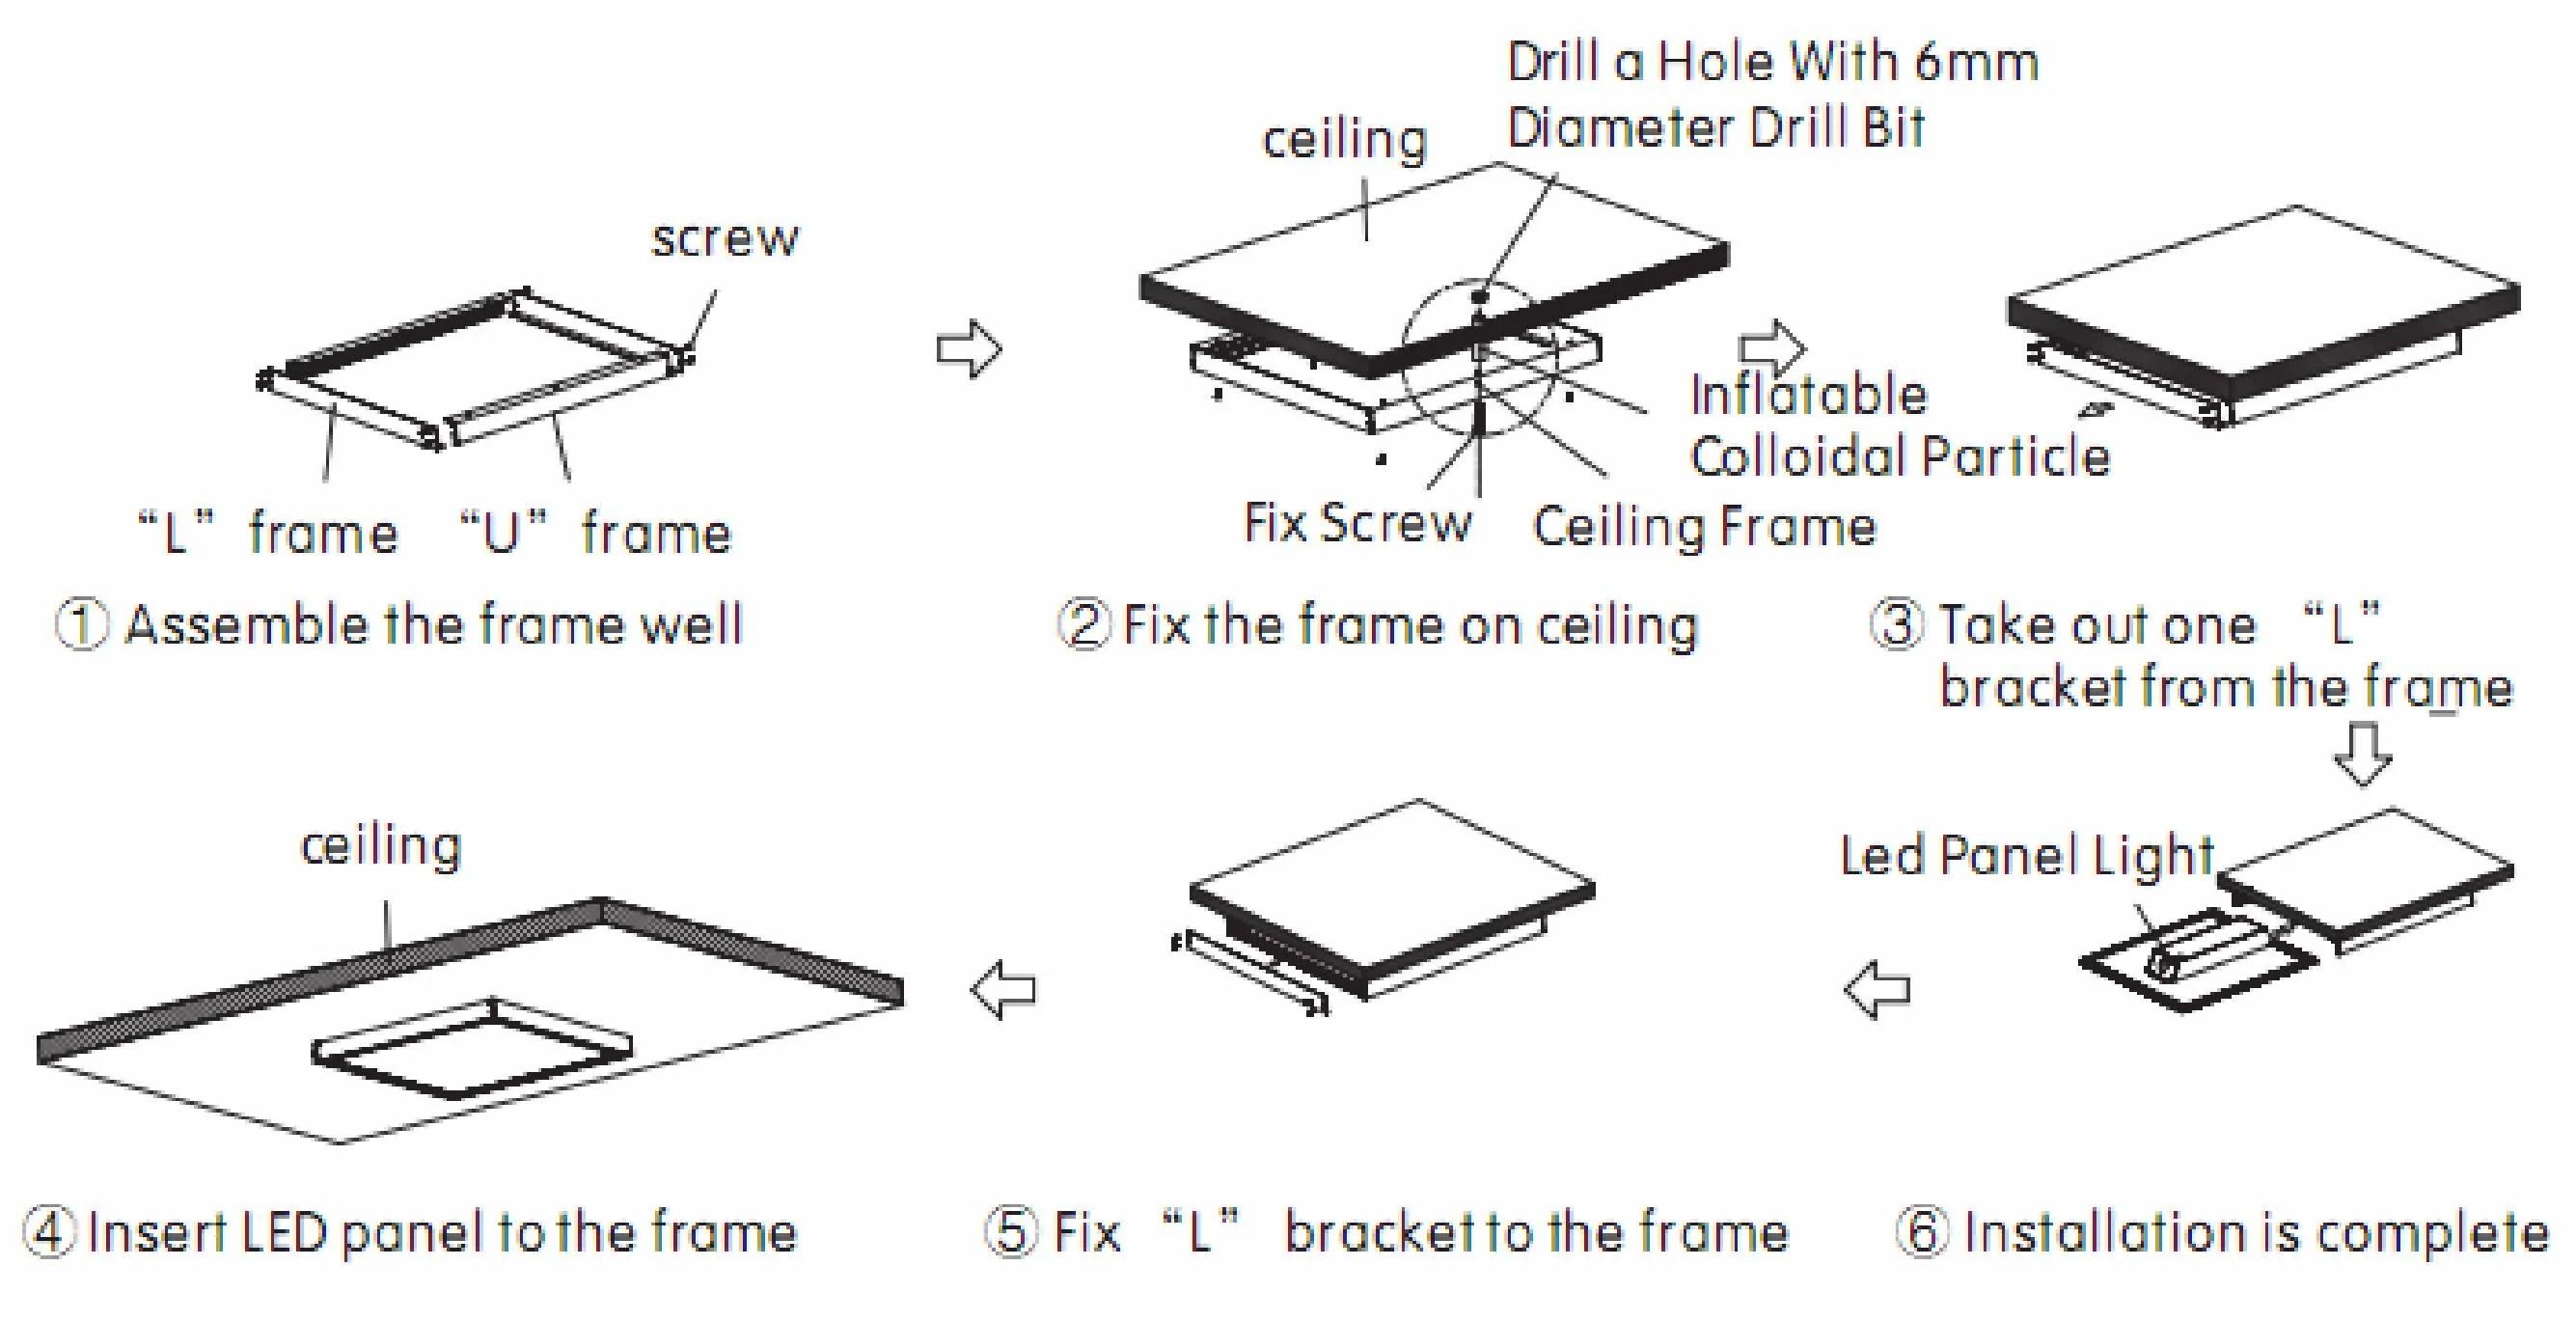 led tv panel diagram wiring diagram post led panel light diagram led panel diagram [ 2670 x 1369 Pixel ]